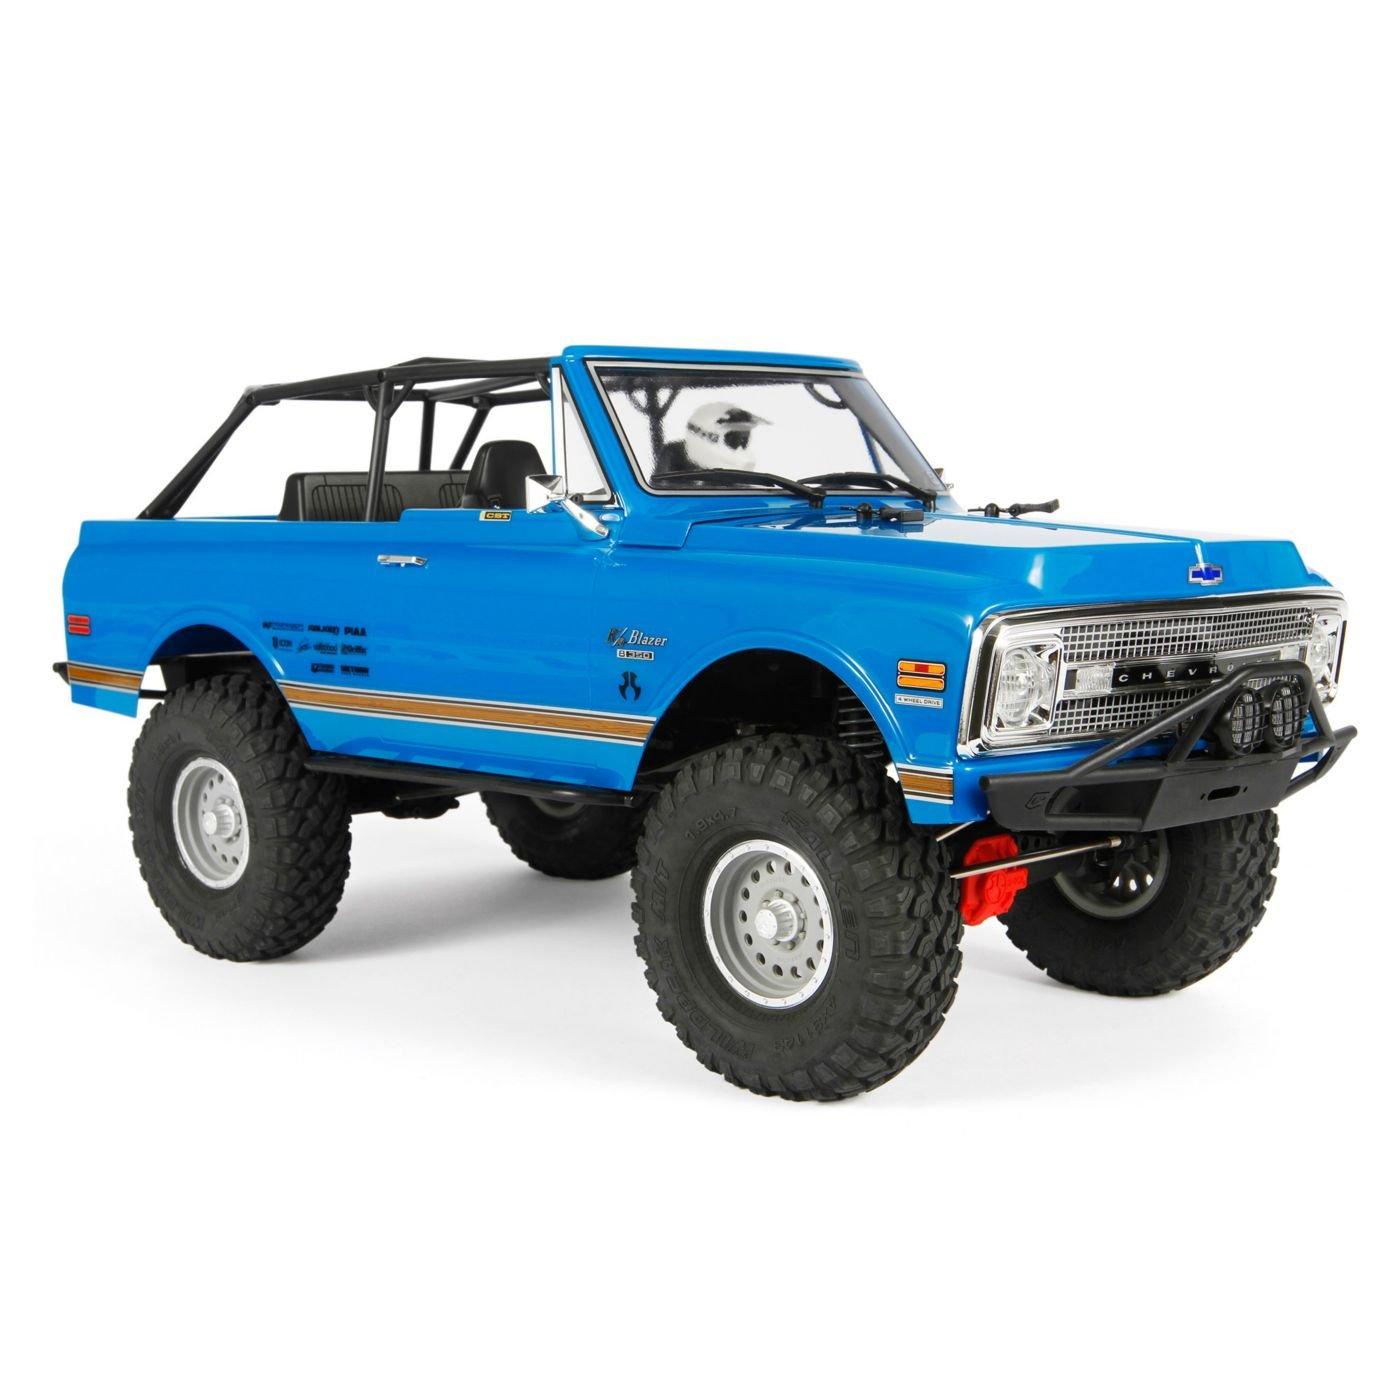 Axial SCX10 II '69 Chevrolet Blazer 4WD RTR RC Rock Crawler Off-Road 4x4, 1/10 Scale (Blue)